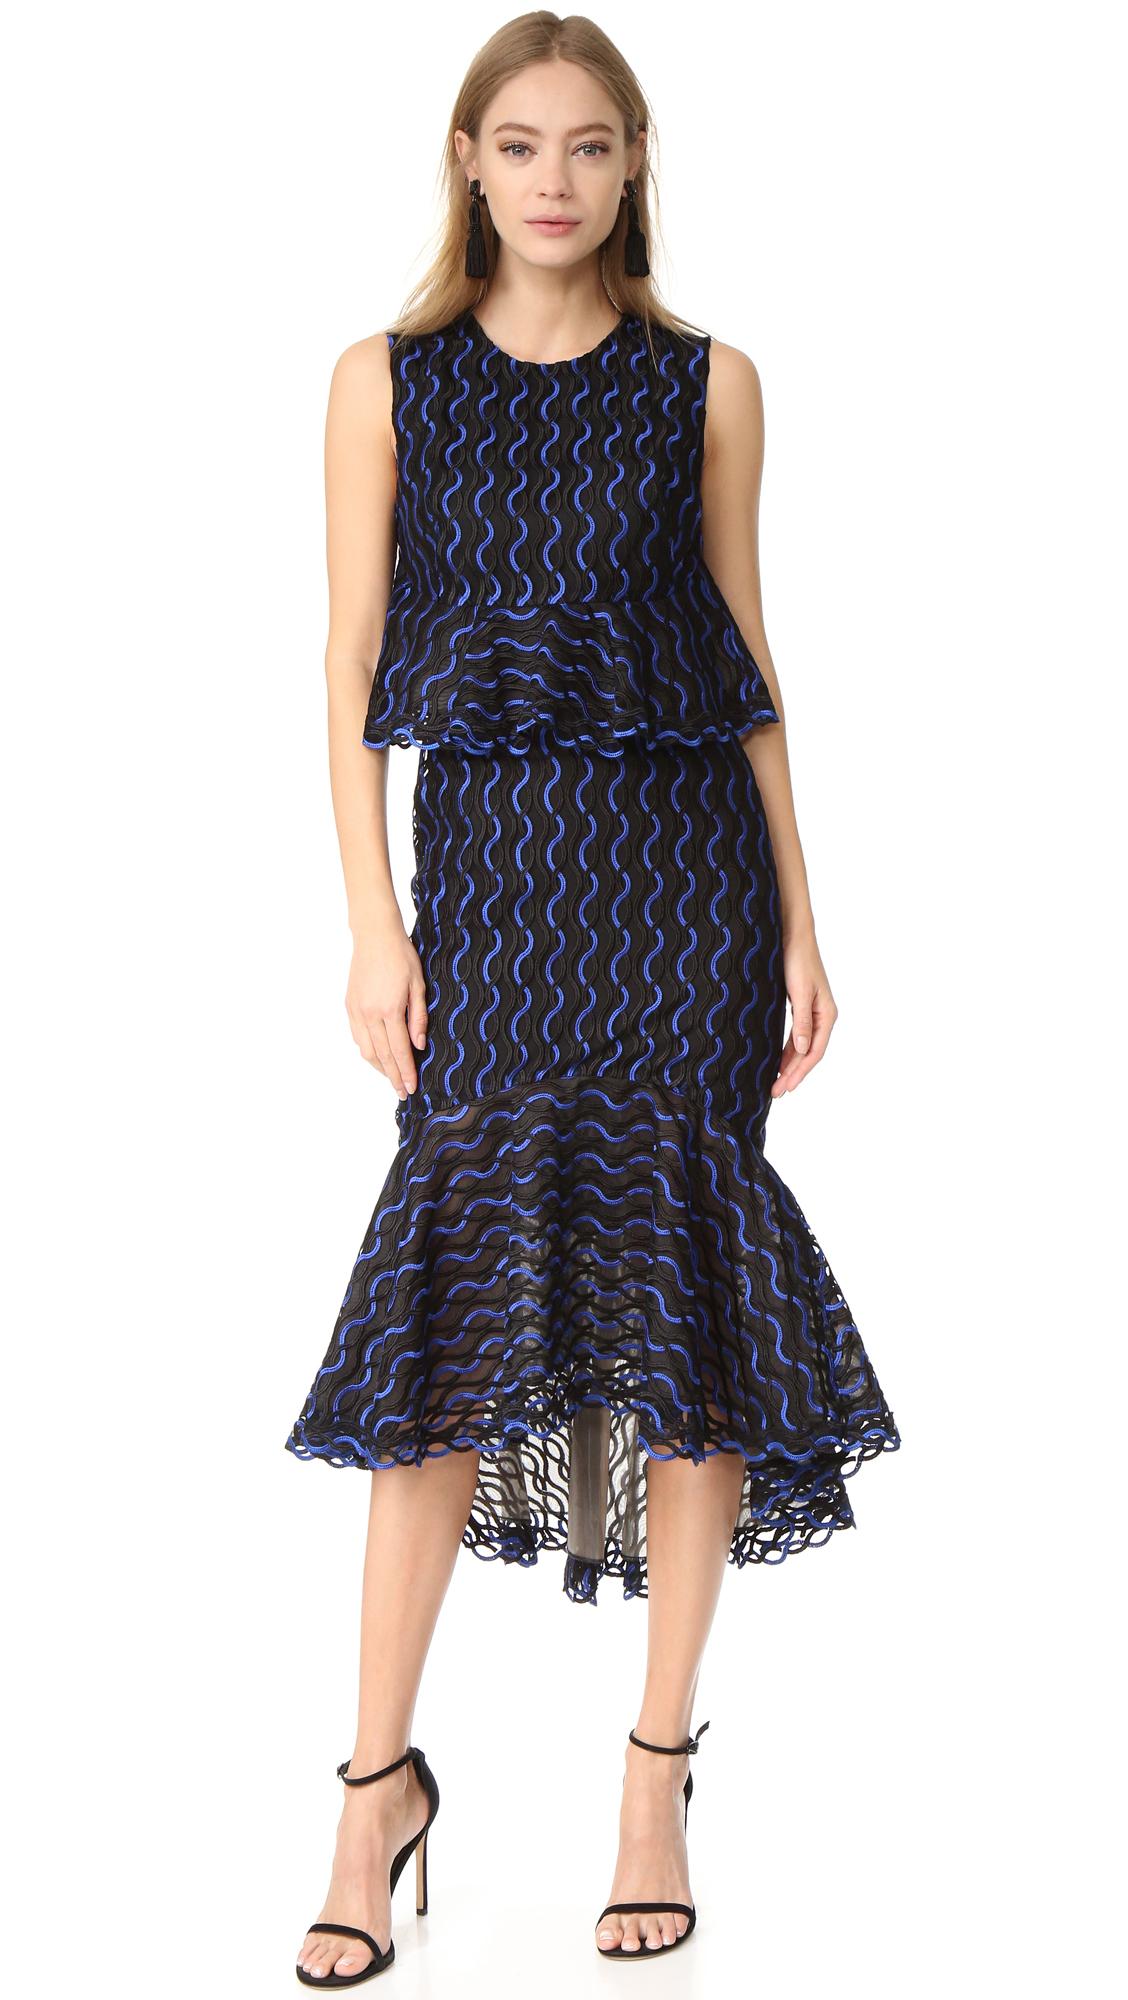 Lela Rose Ruffle Skirt Dress - Lapis/Black